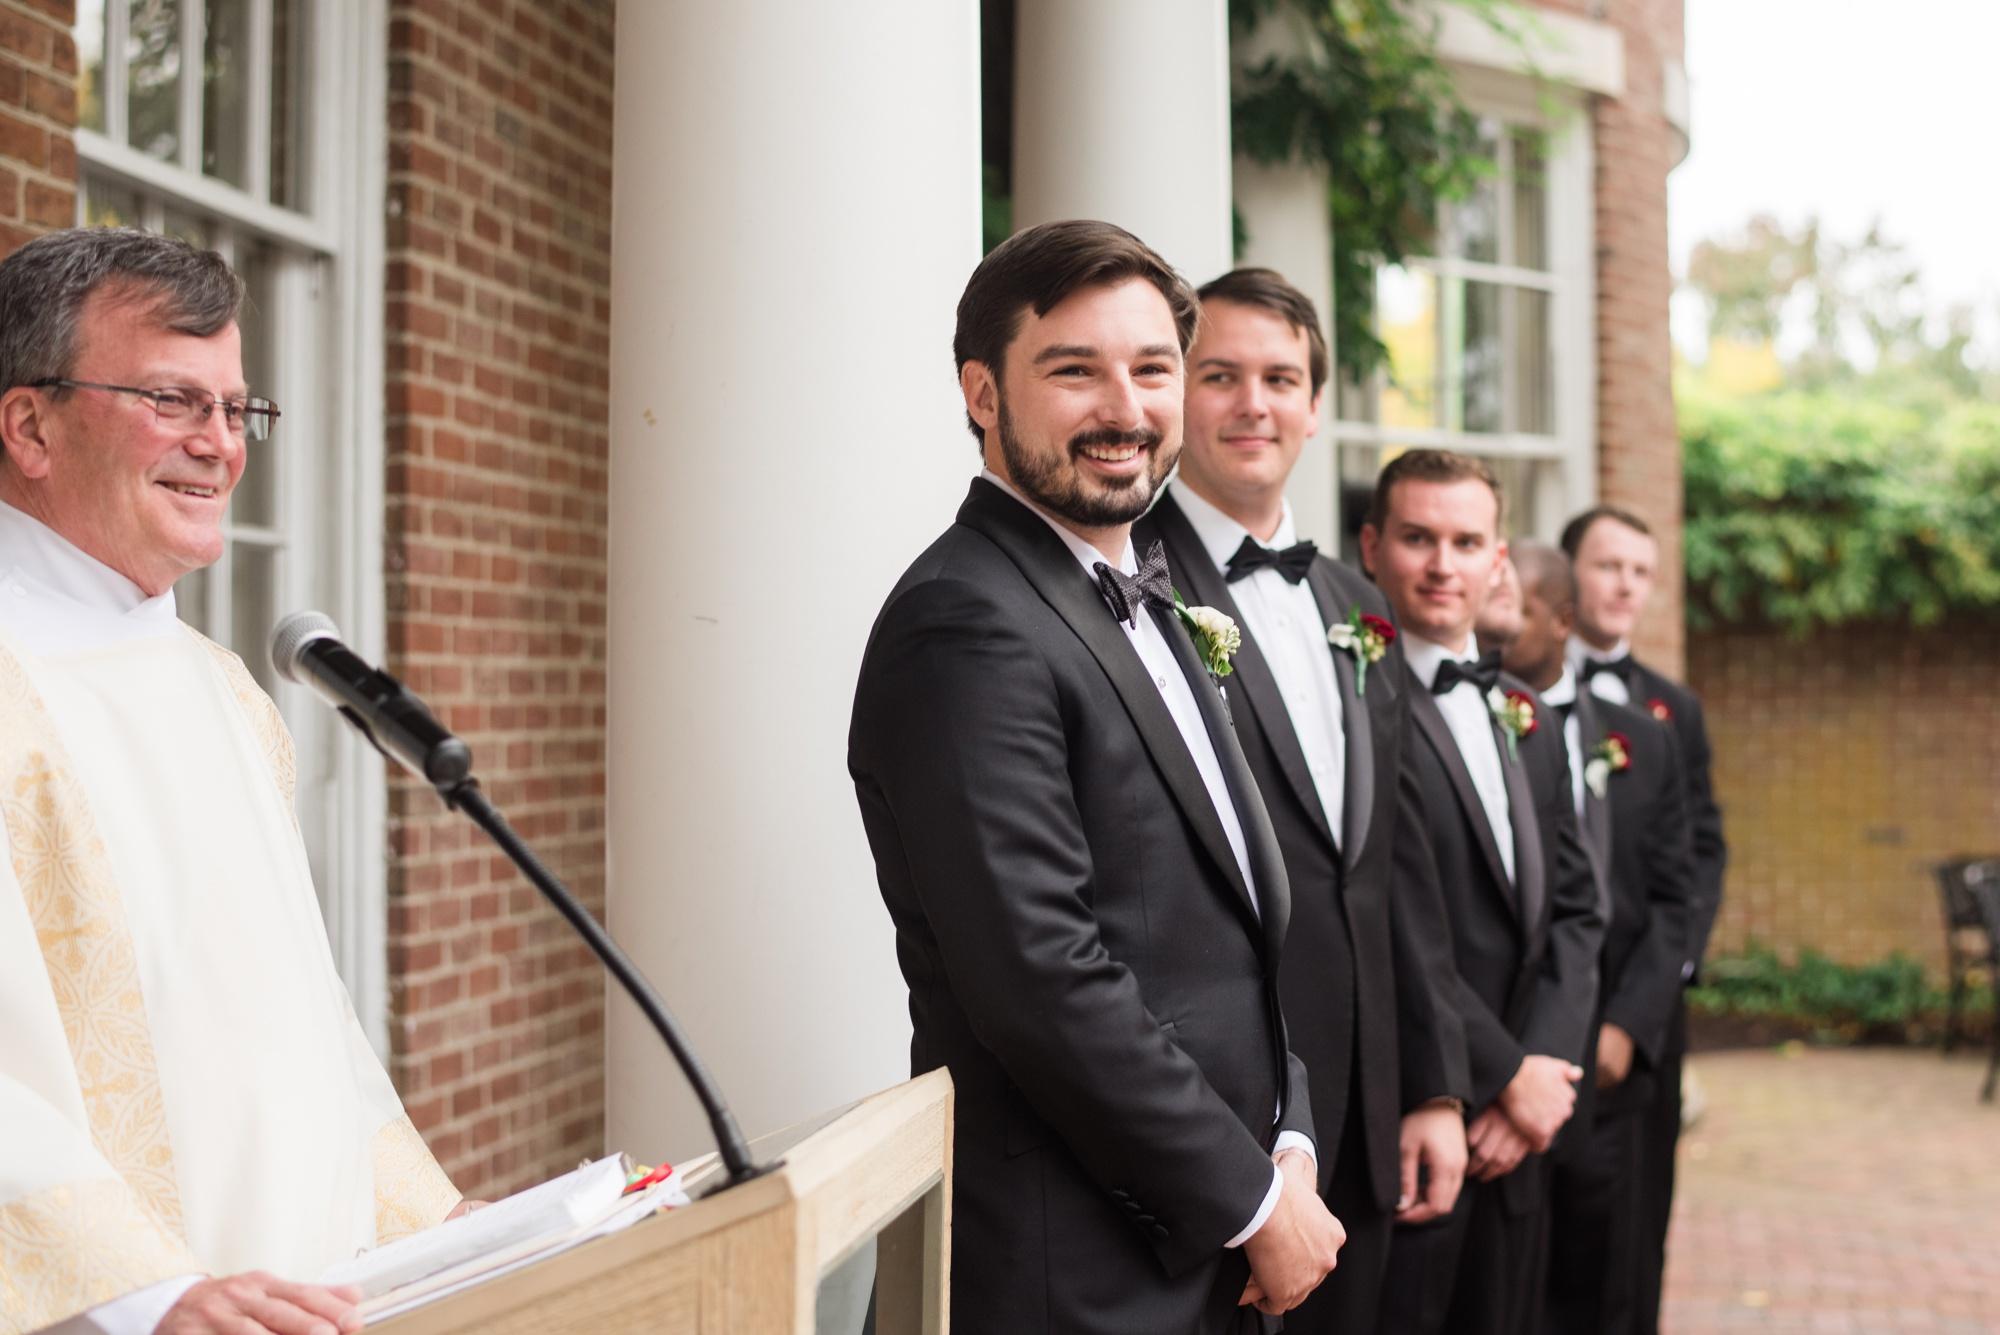 groom reacts seeing his bride